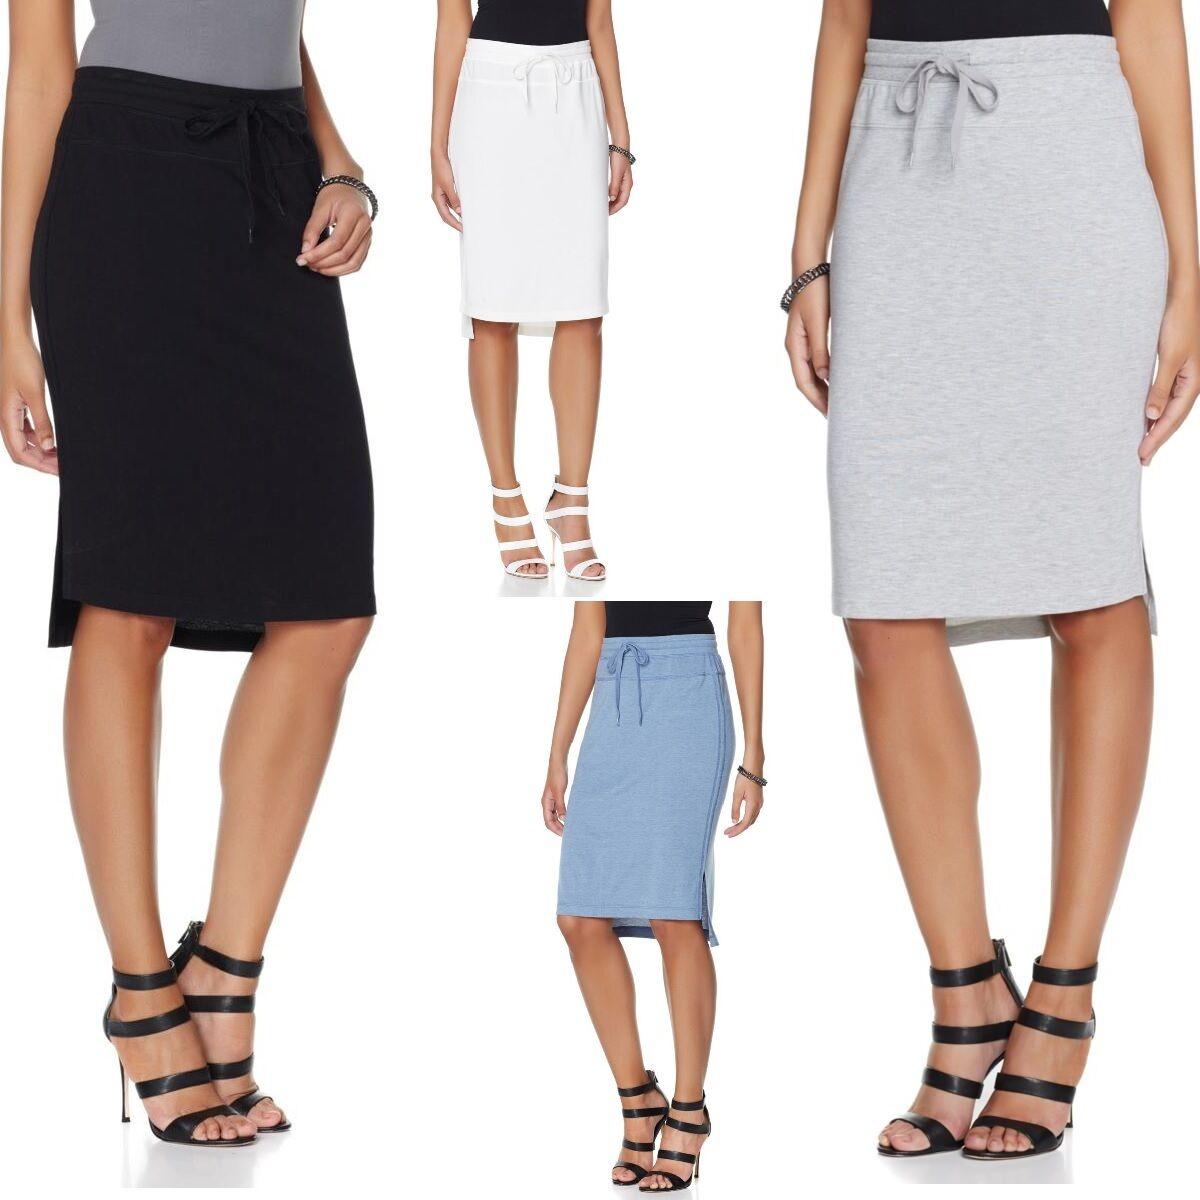 Wendy Williams Tie-Waisted Skirt 469762-J (Med. & Lrg.)